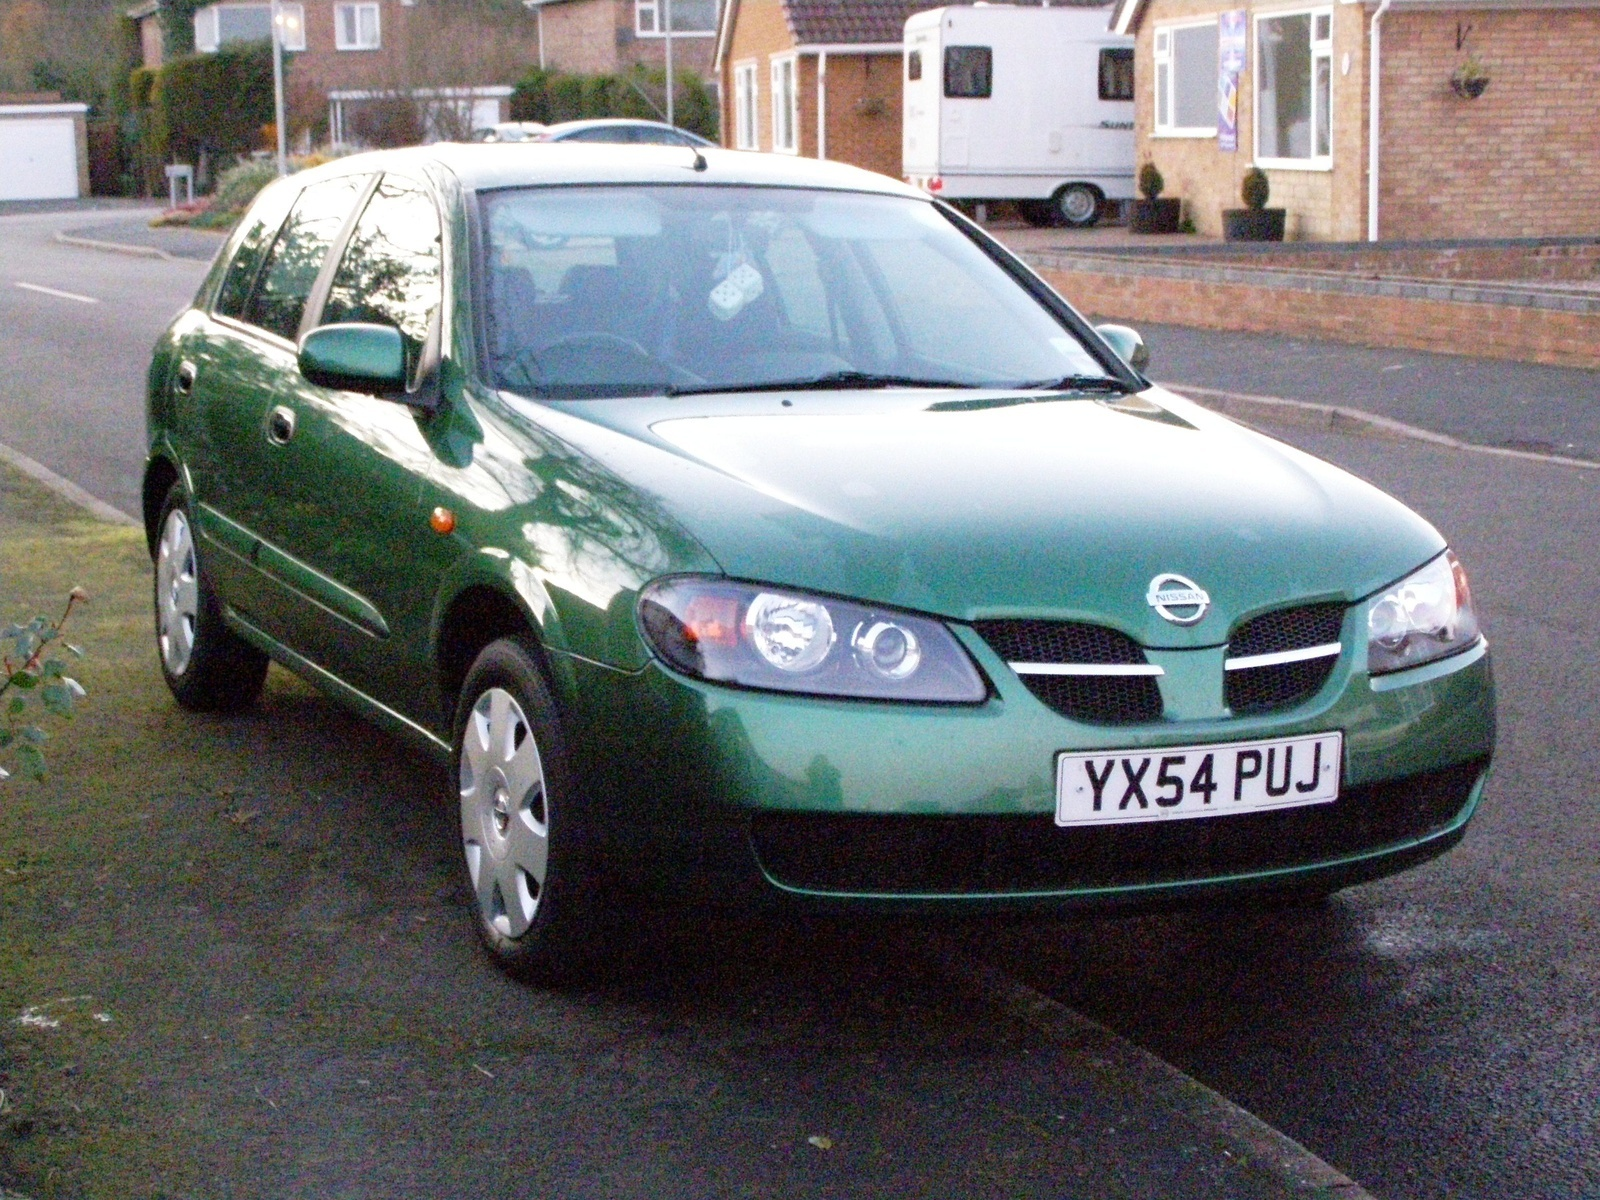 2004 Nissan Almera - Overview - CarGurus